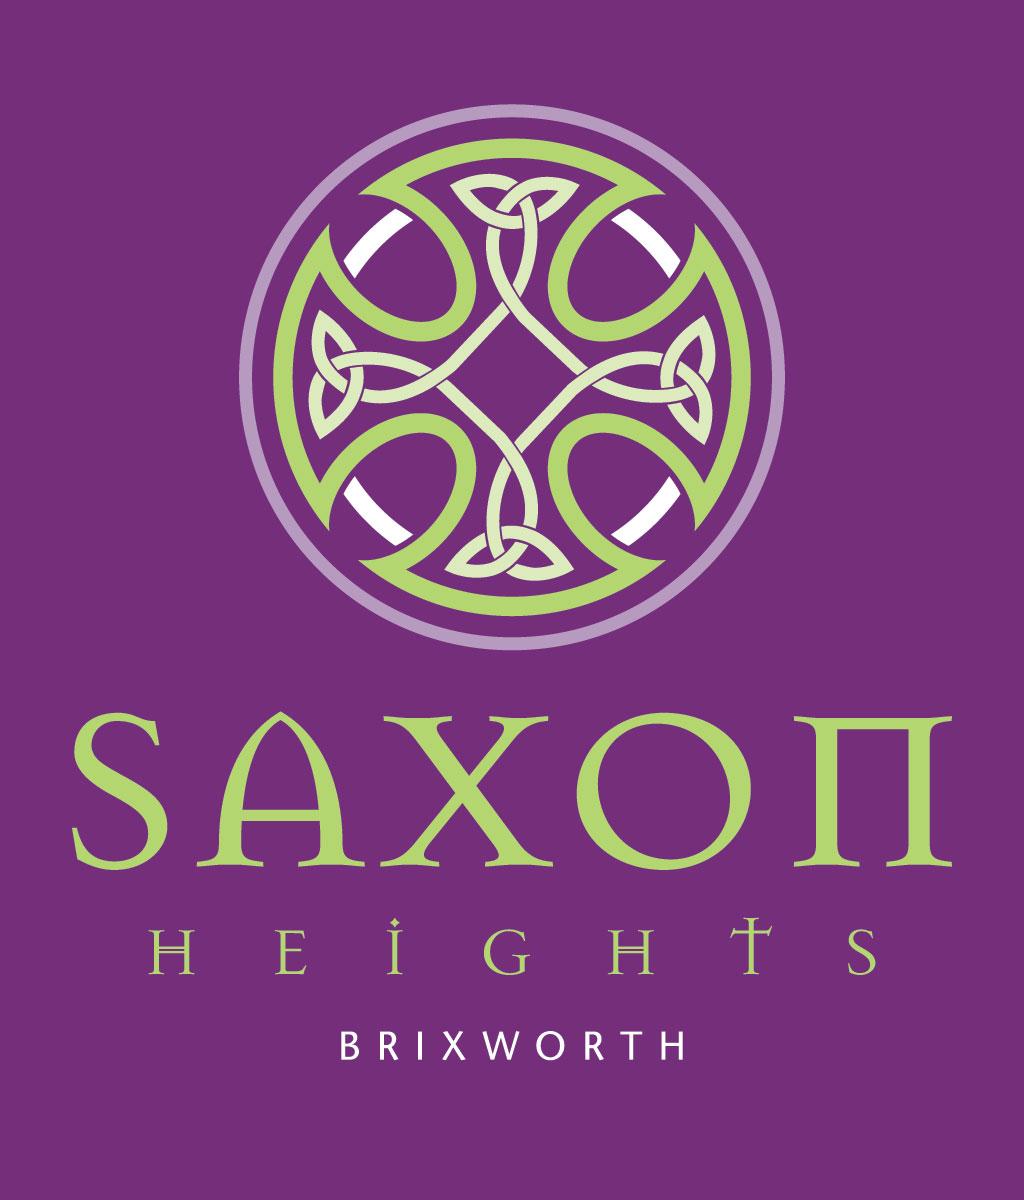 Saxon Heights logo